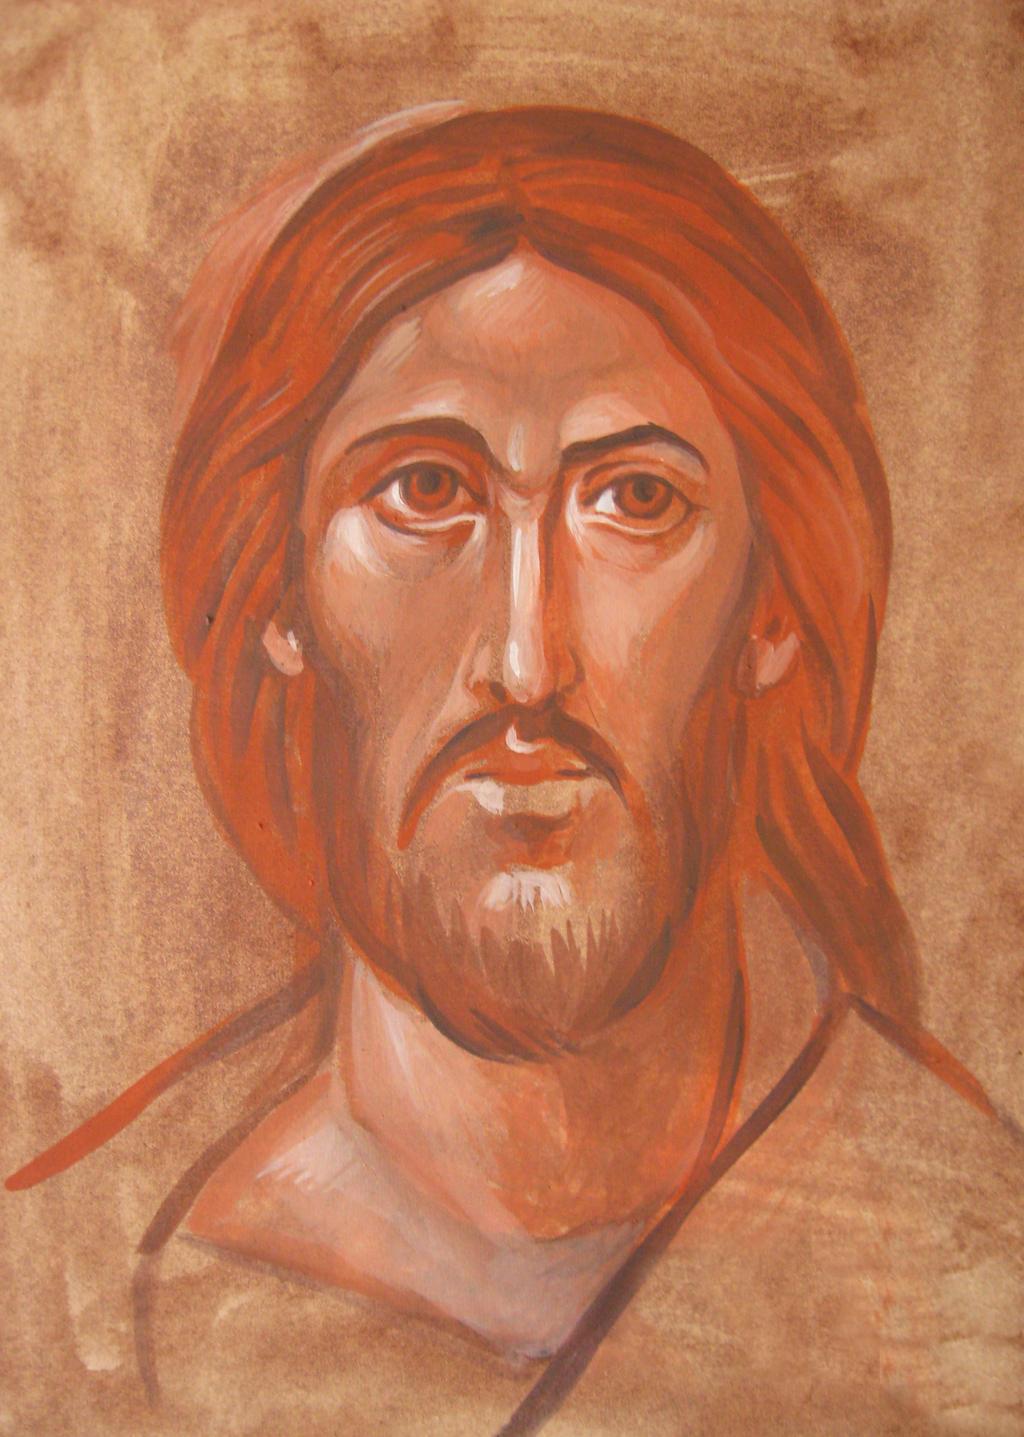 Image of Jesus Christ by yellika